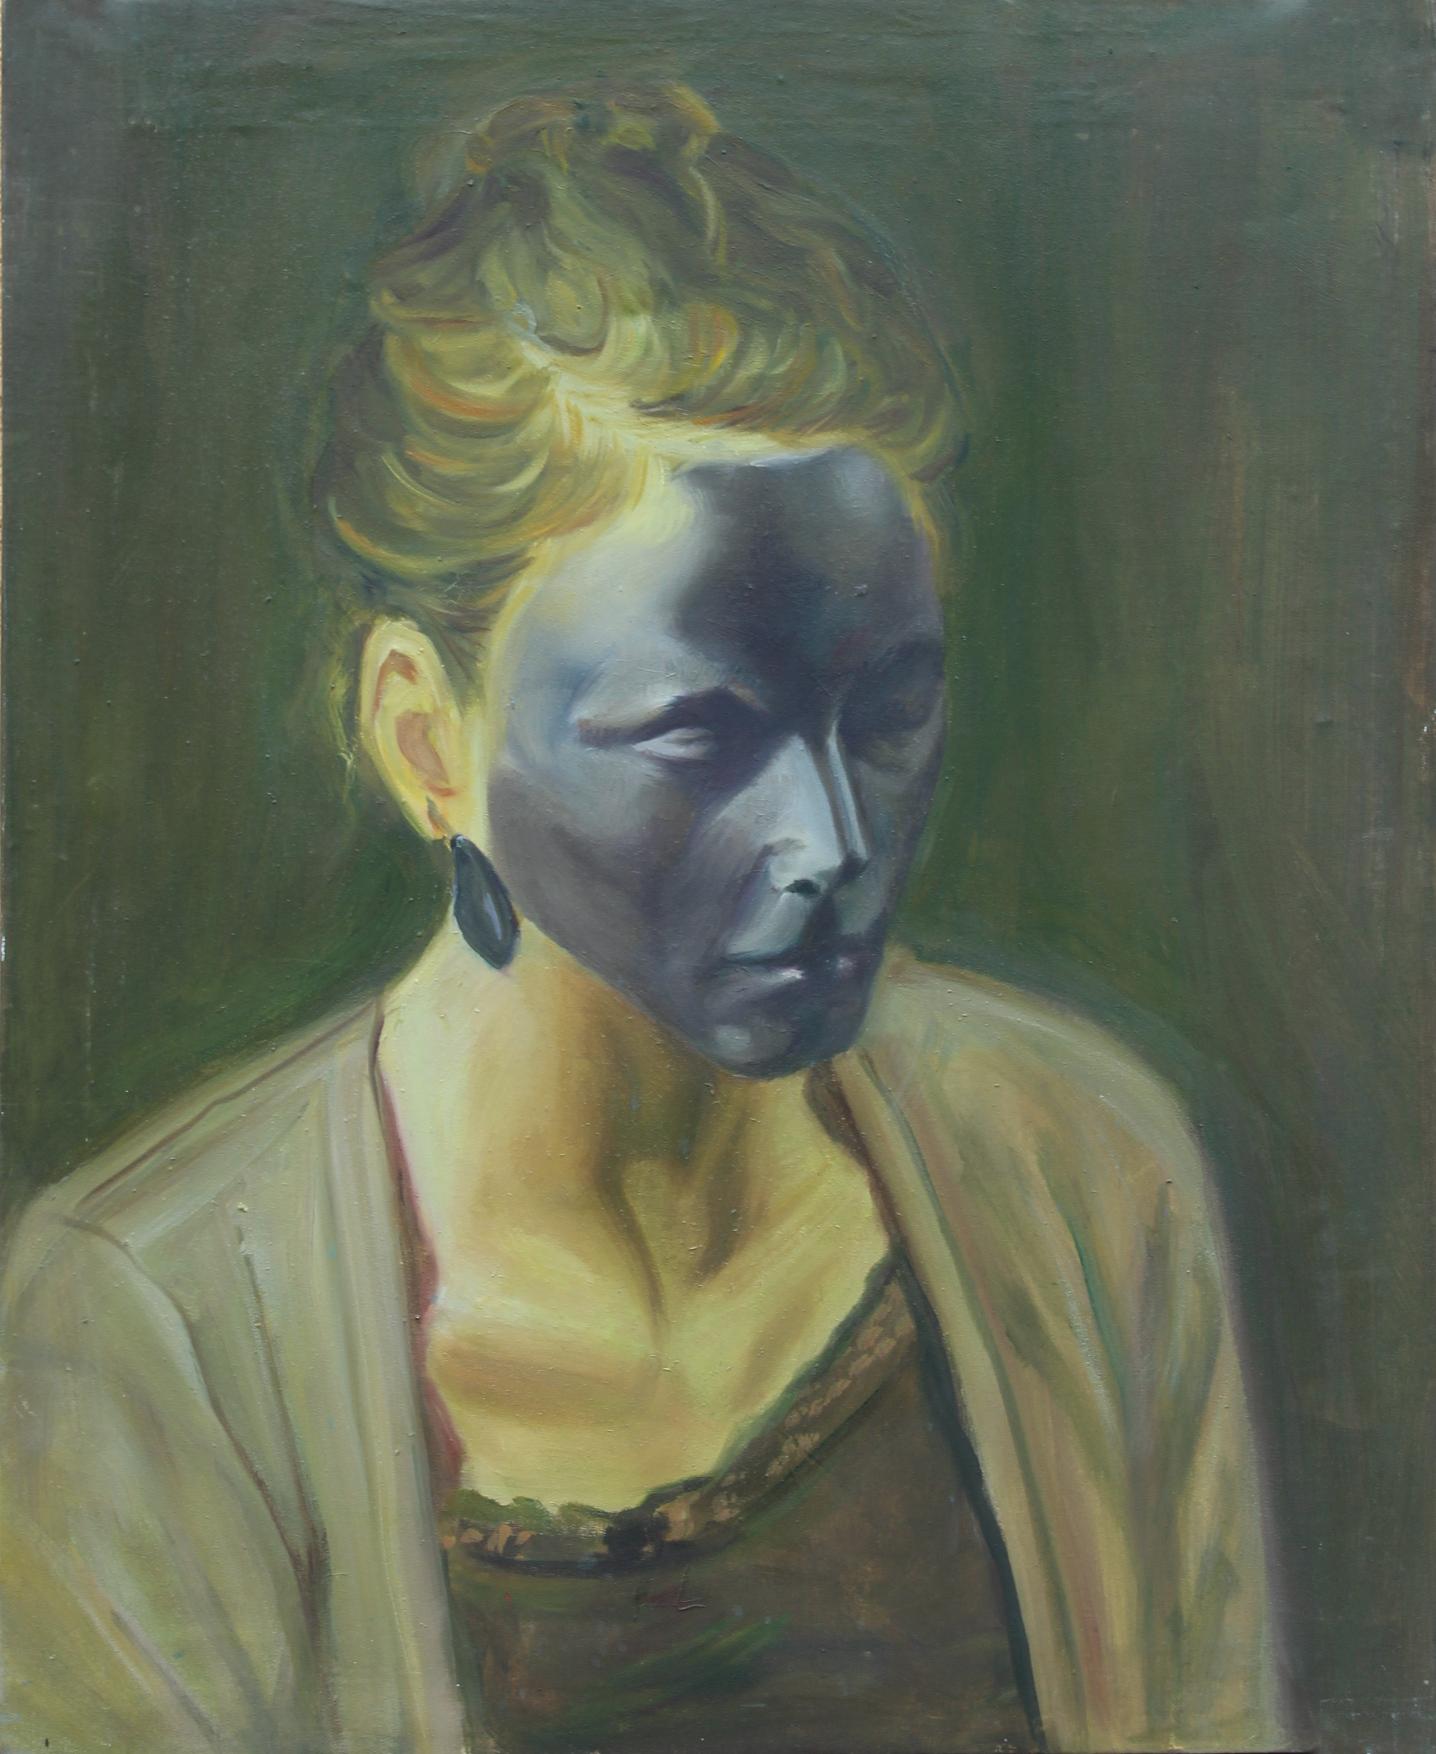 adrienn erdei Self portrait, oil on canvas, 50 × 70 cm, 2014.